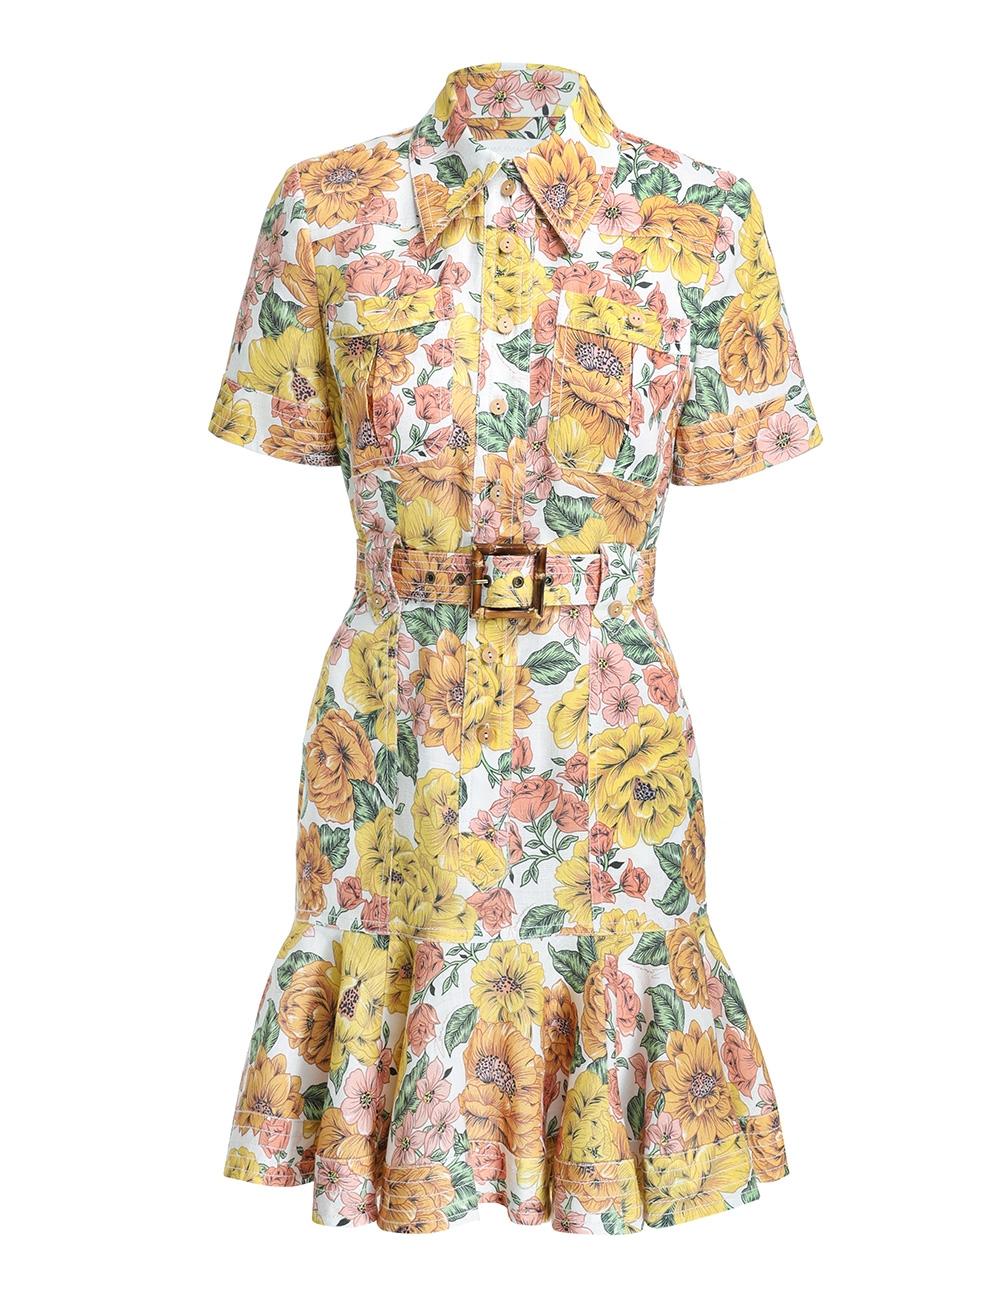 Poppy Belted Mini Dress